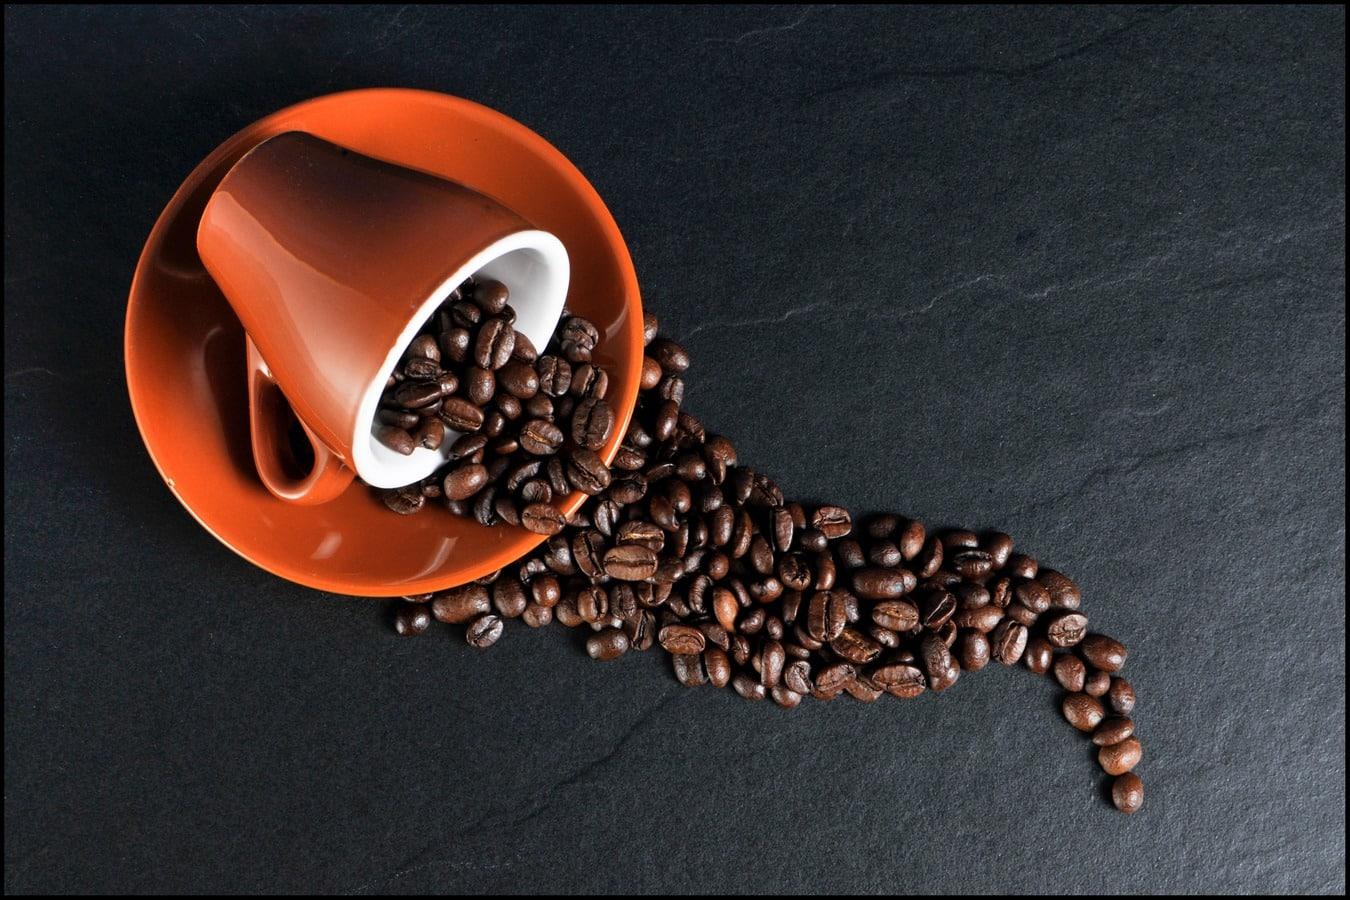 O certo é cup of coffee ou coffee cup?